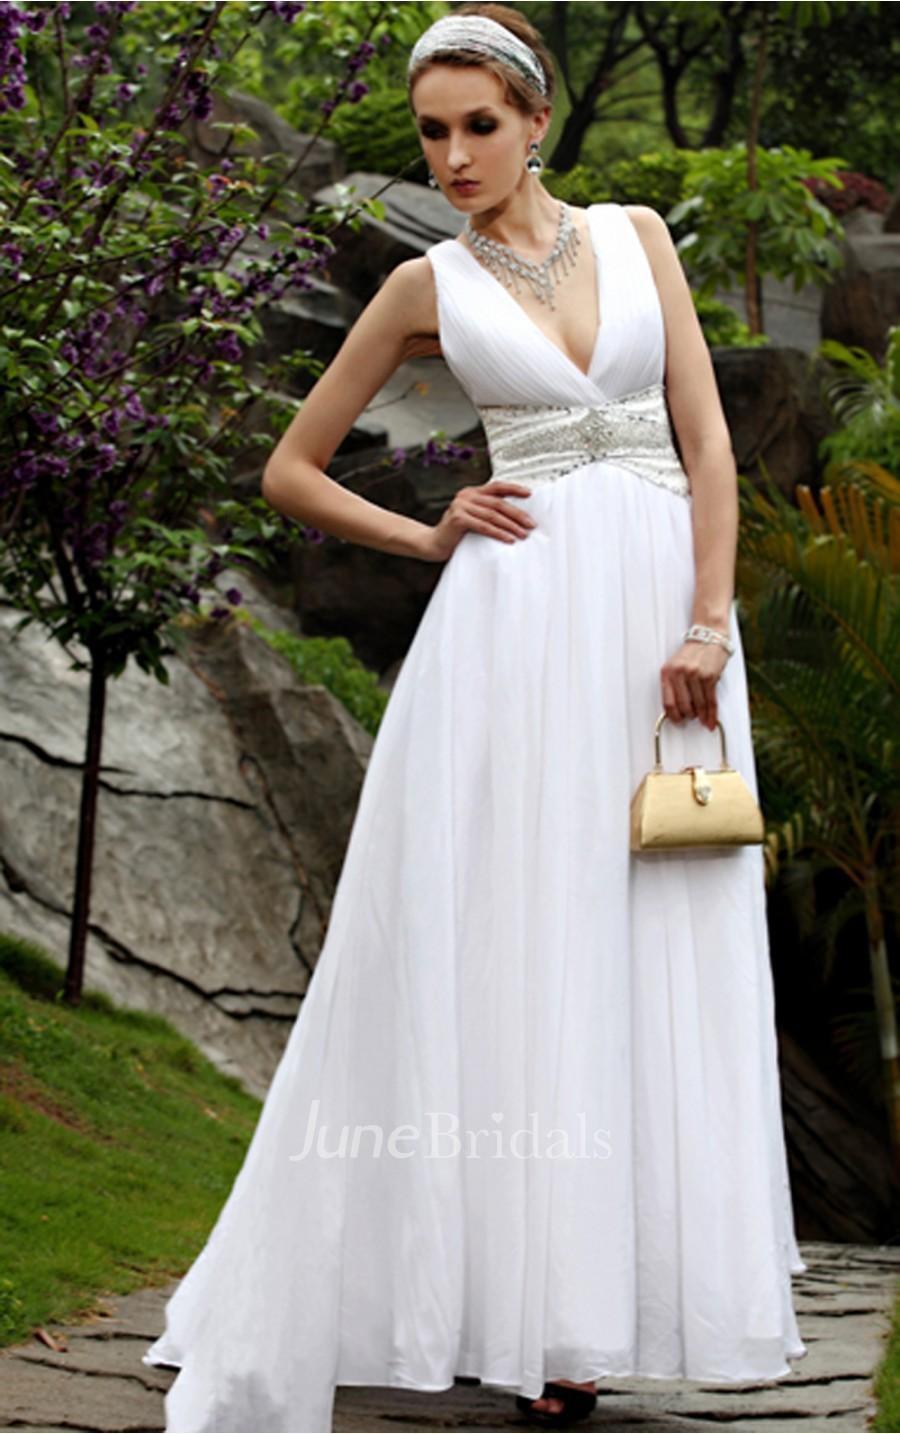 Elegant White A Line Floor Length V Neck Dress June Bridals